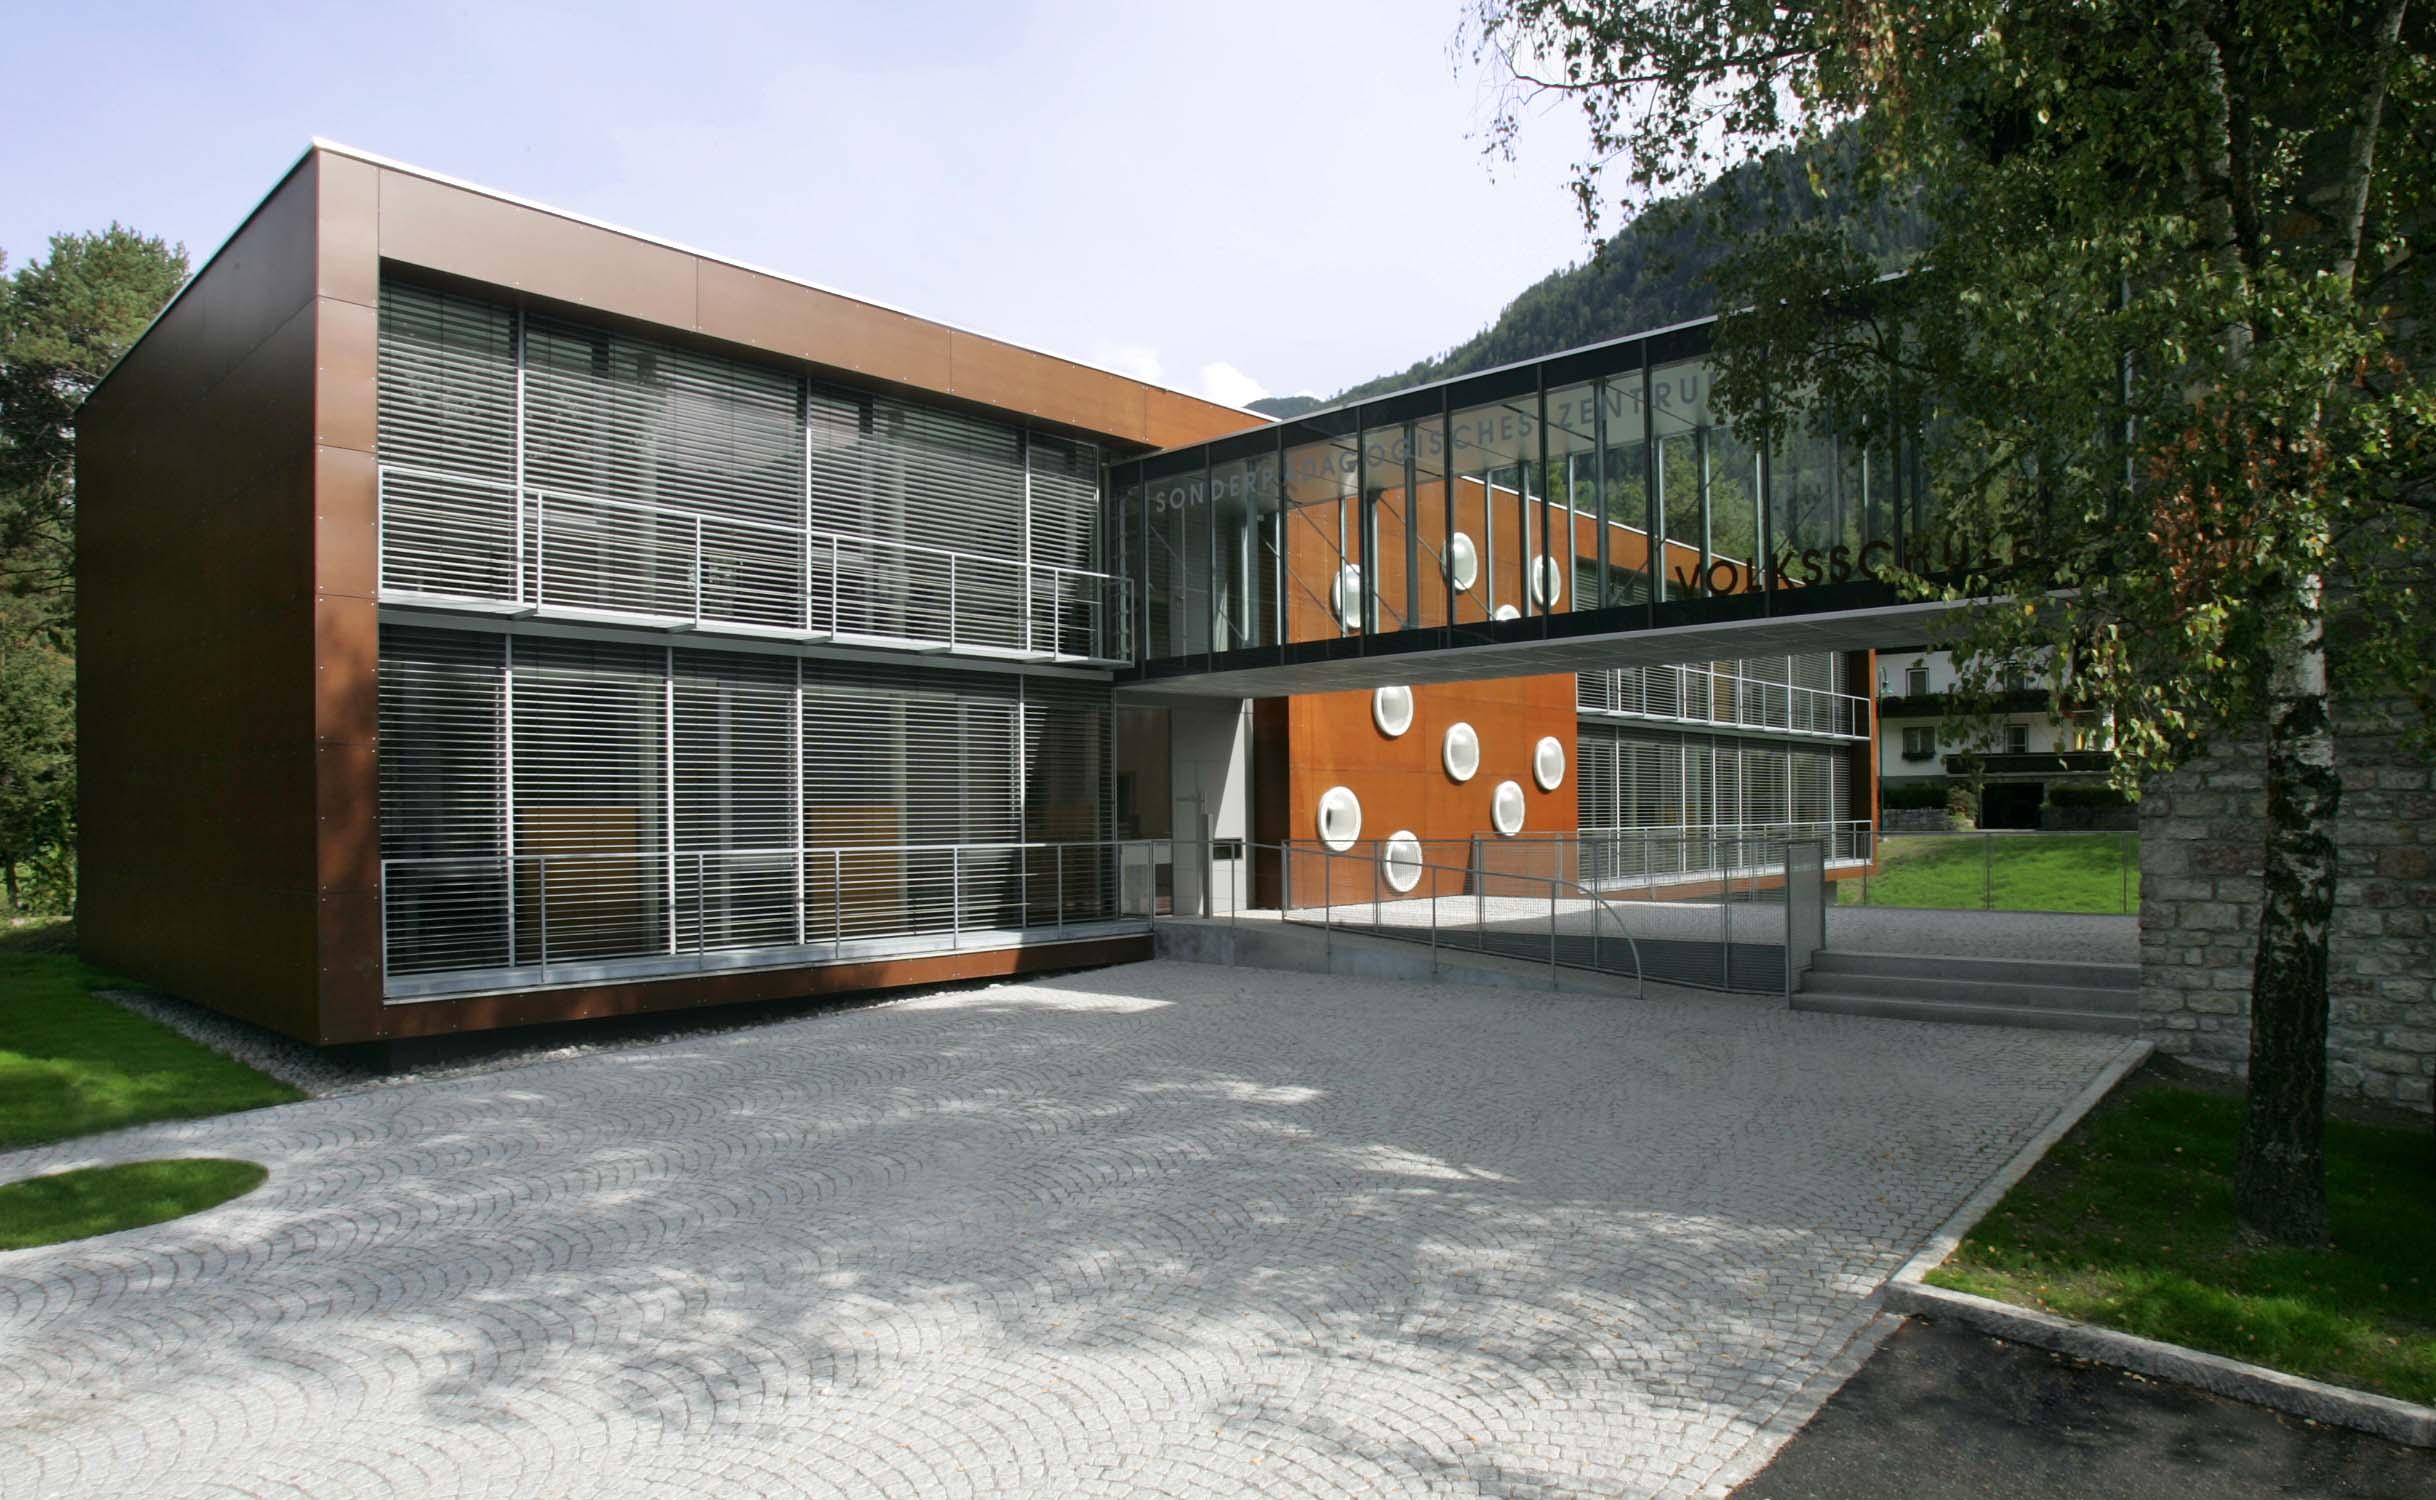 spz haiming | roeck architekten